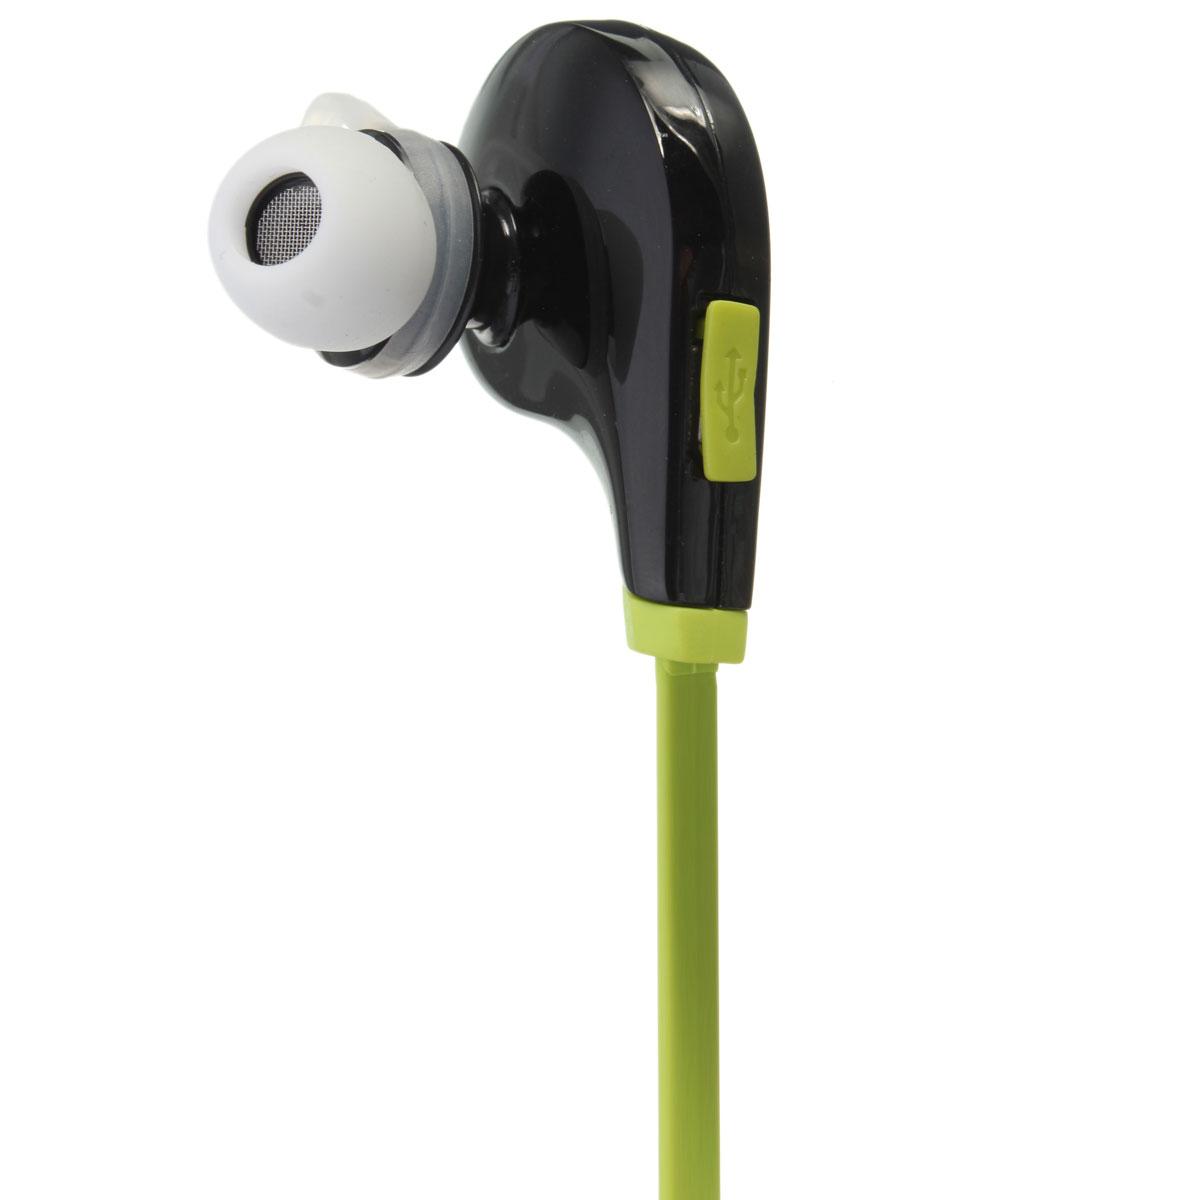 stereo bluetooth sport headset listen mobile phone music black green lazada ph. Black Bedroom Furniture Sets. Home Design Ideas